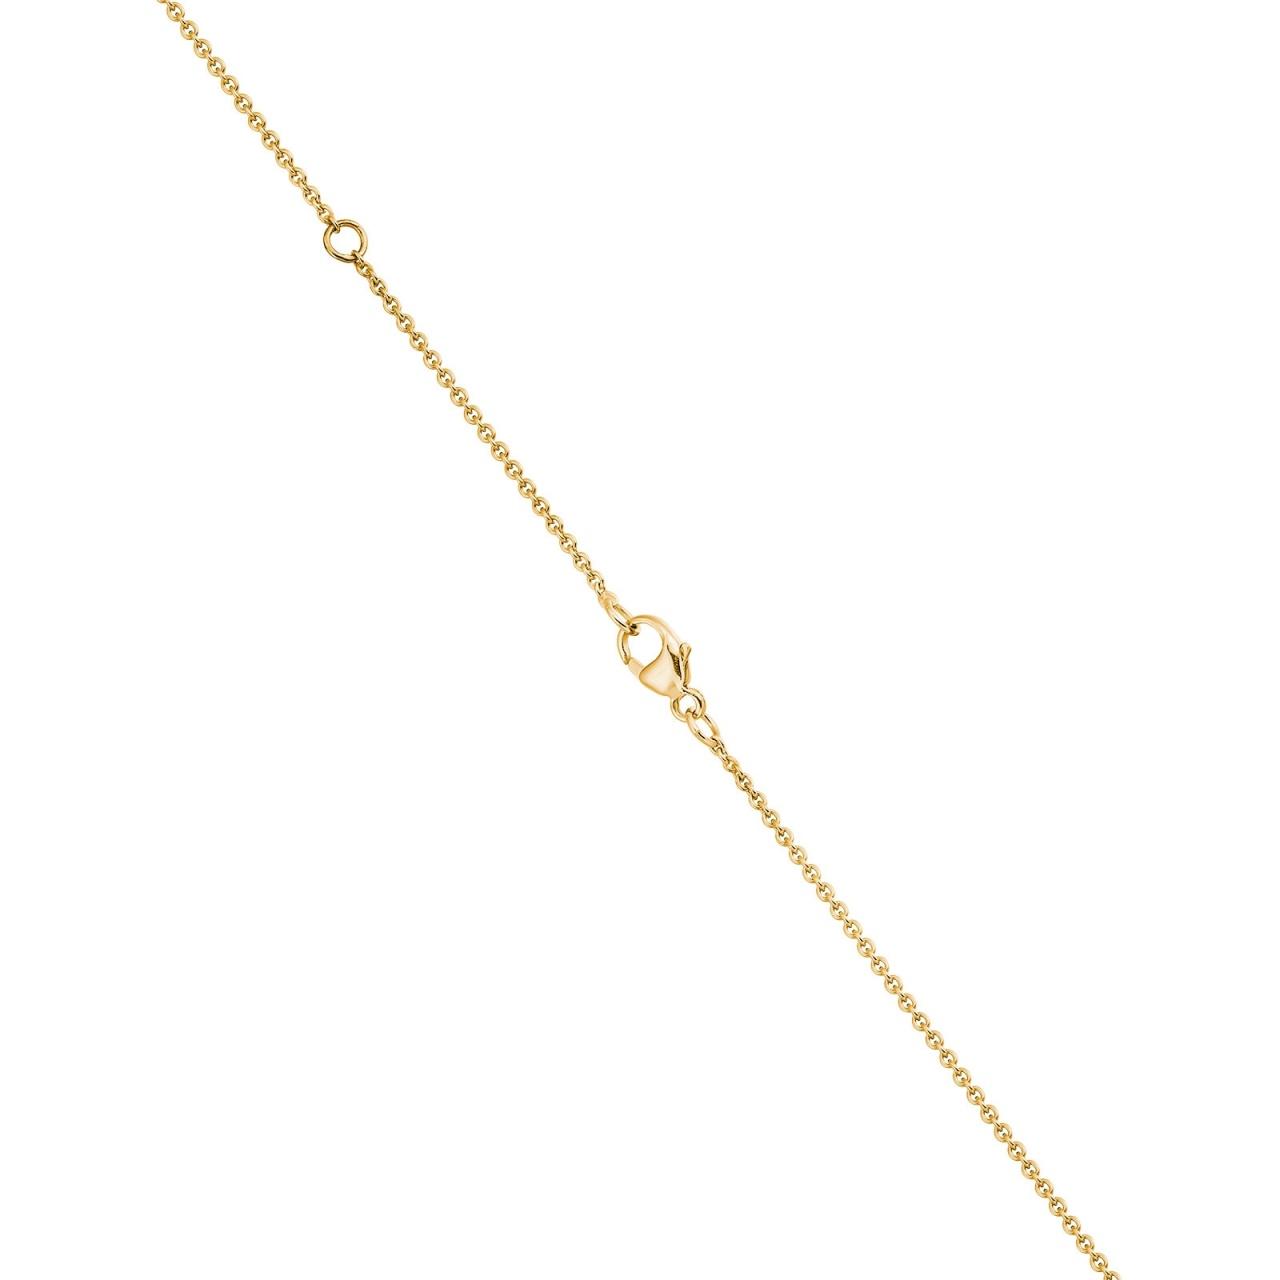 Astral Blaze Akoya Pearl Pendant in Yellow Gold-APWRYG1331-1